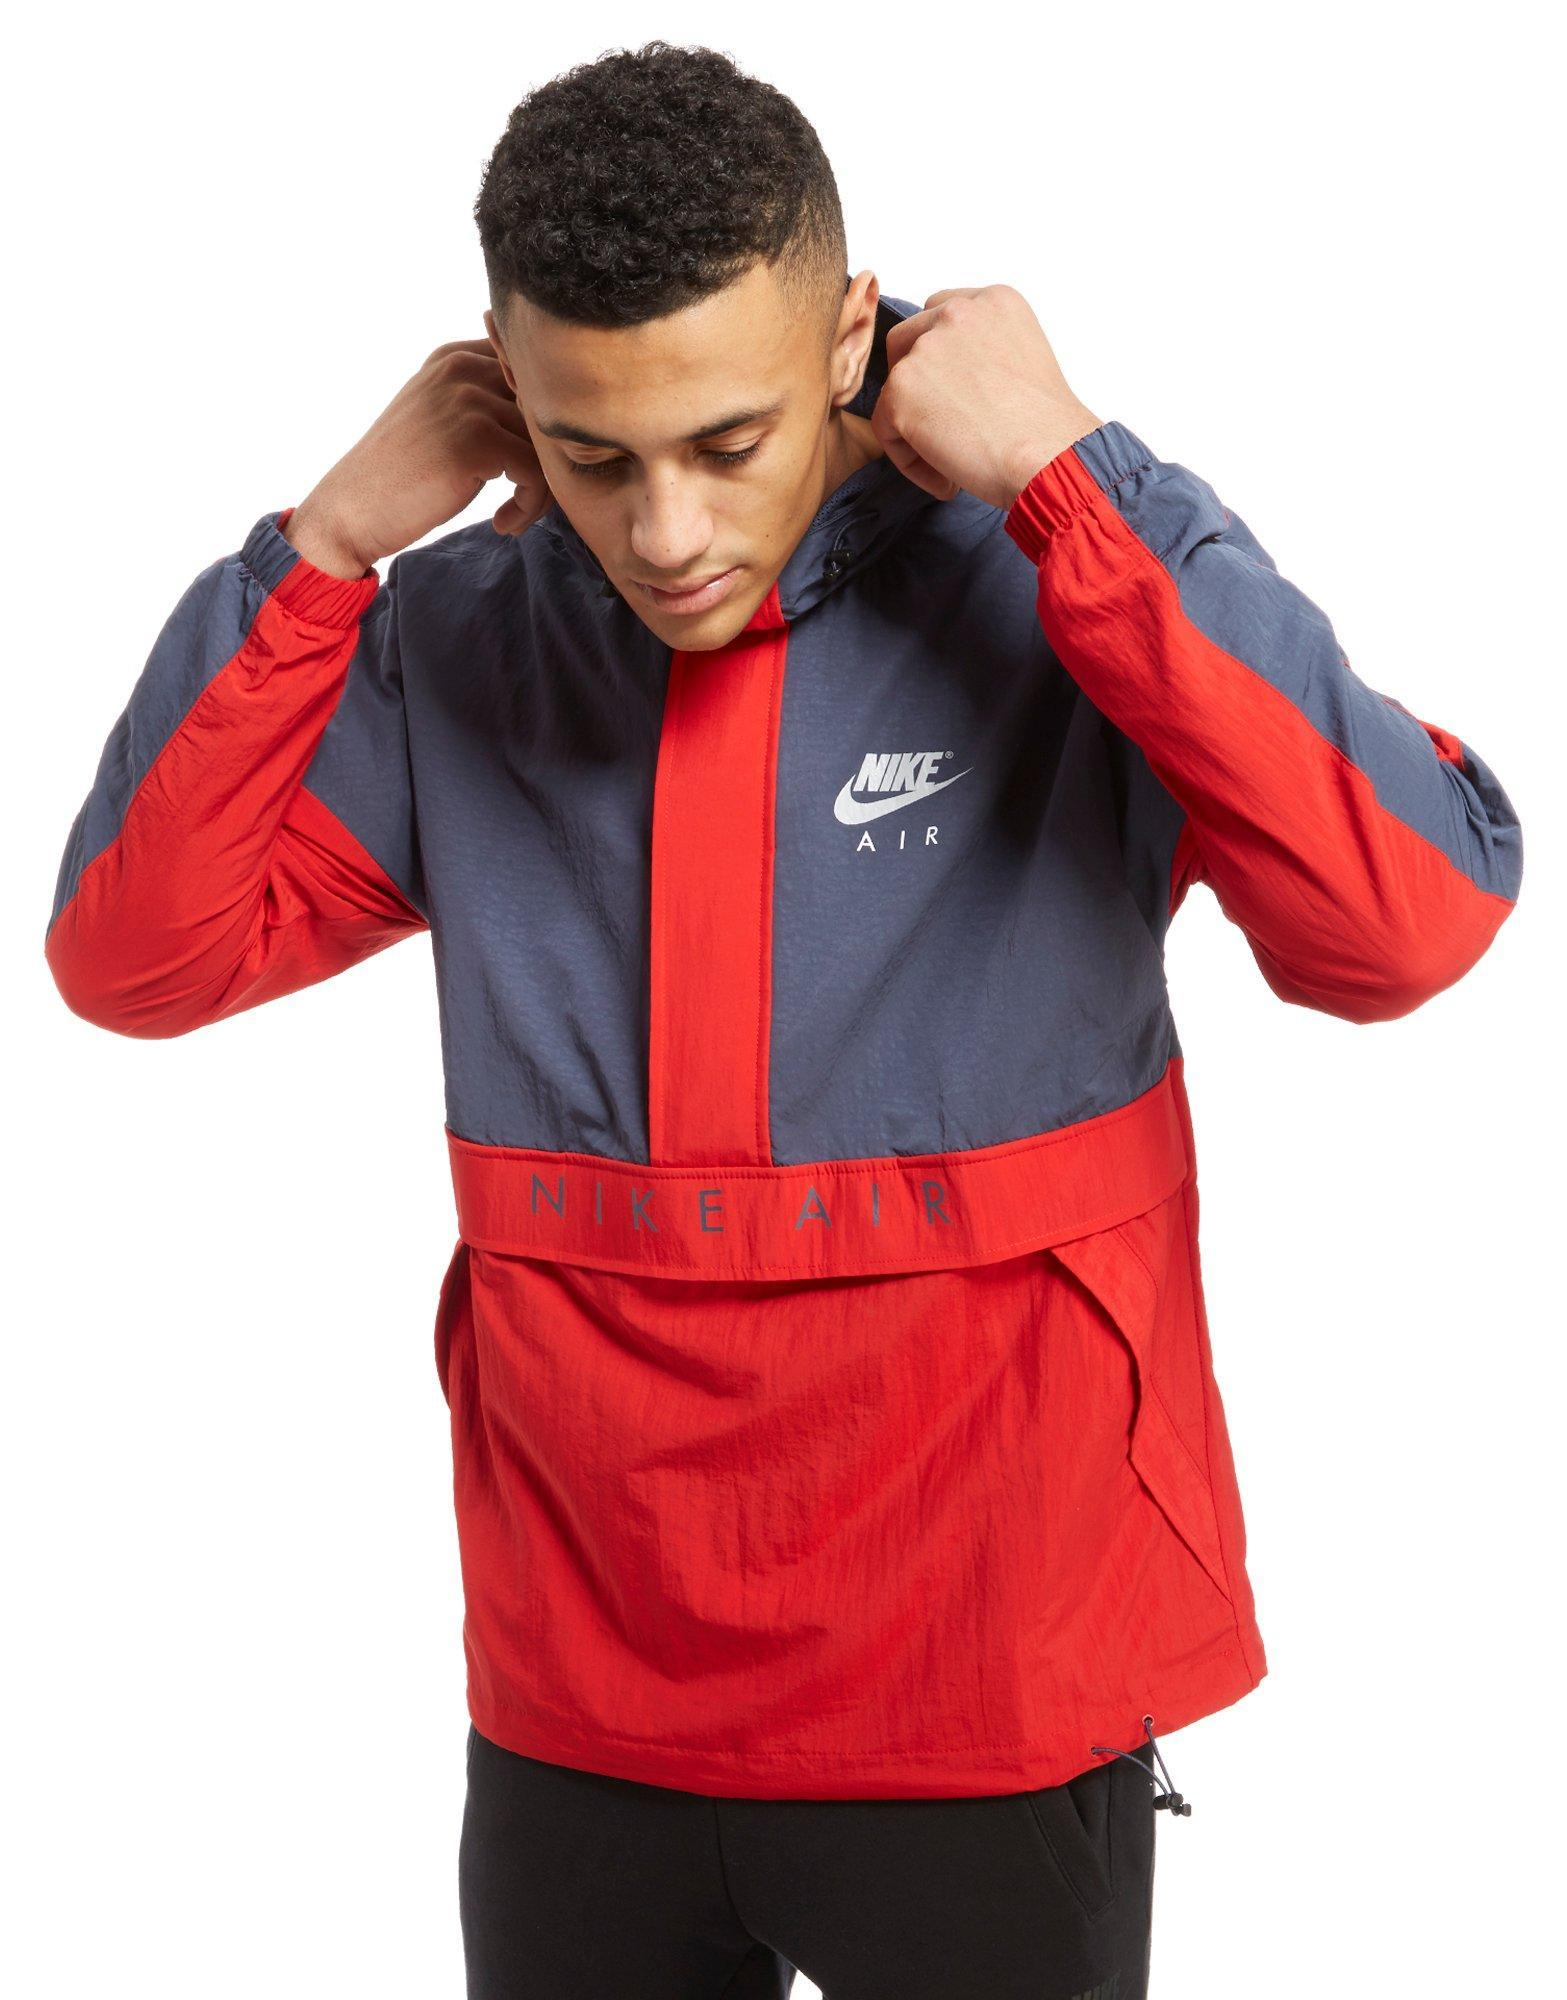 nike air half zip jacket in red for men lyst. Black Bedroom Furniture Sets. Home Design Ideas